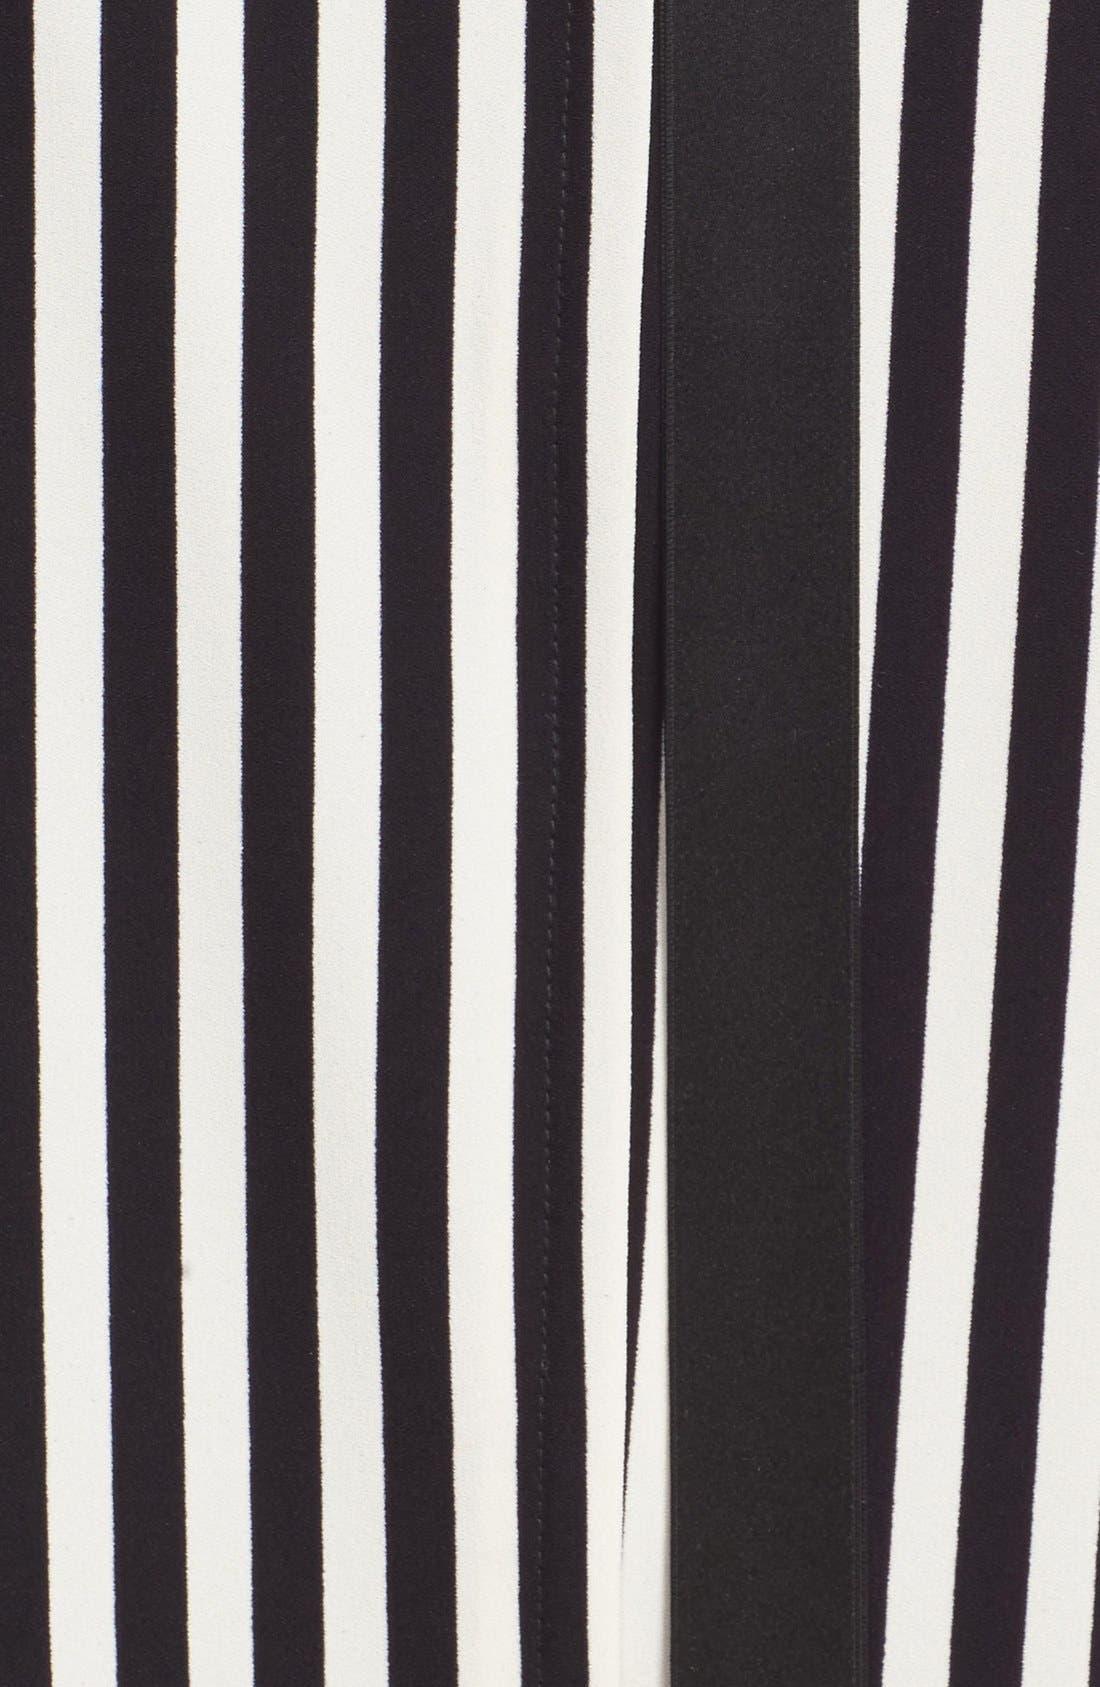 Alternate Image 3  - MARC JACOBS Stripe Crepe Babydoll Dress